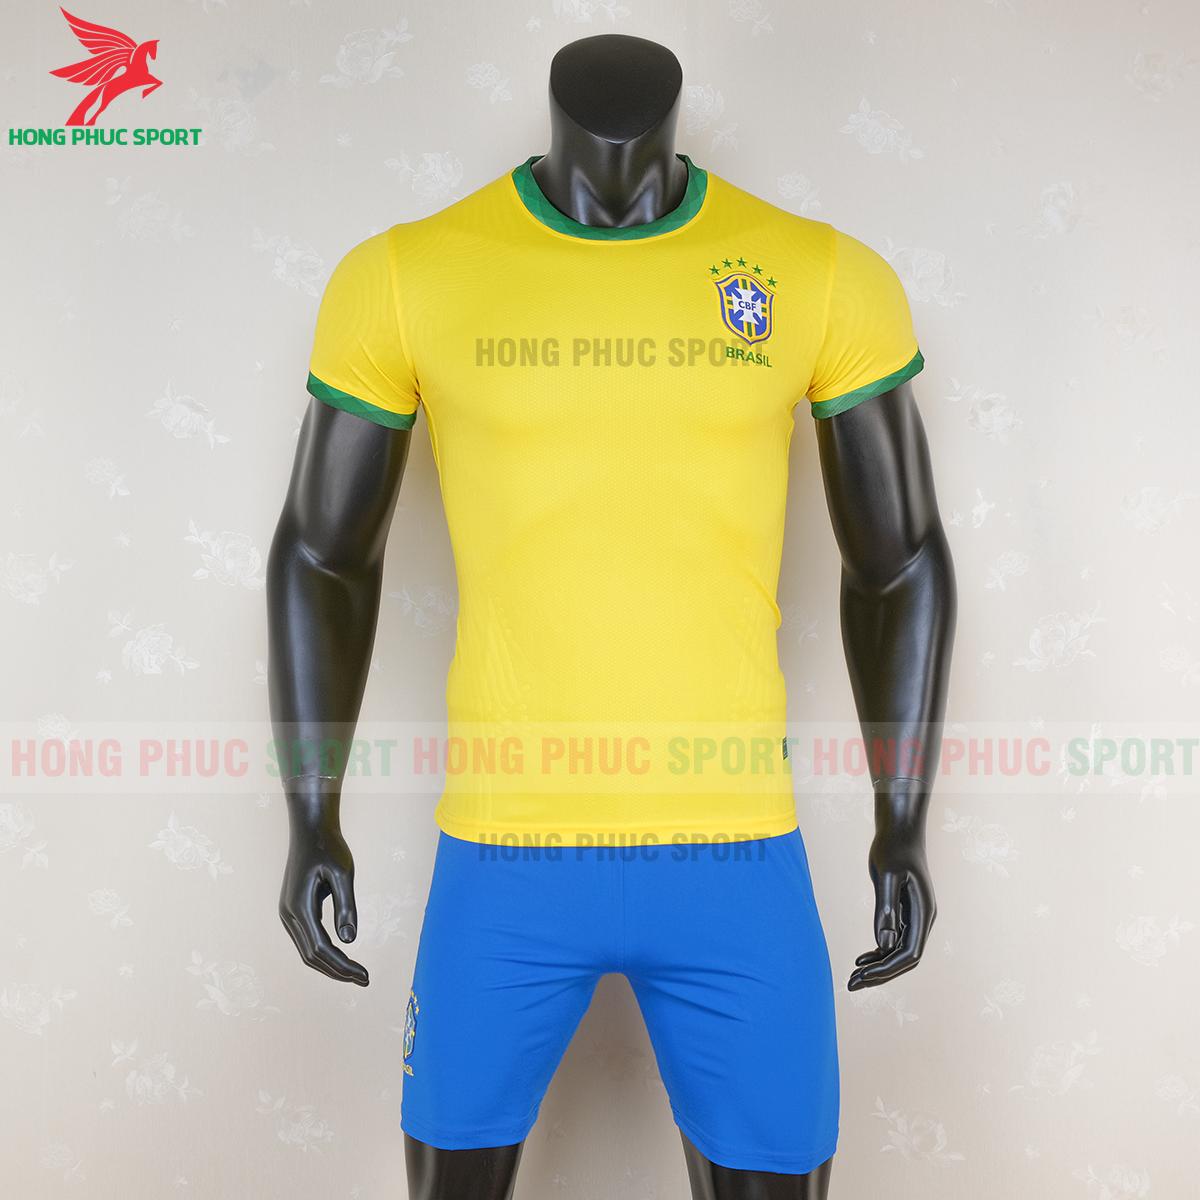 https://cdn.hongphucsport.com/unsafe/s4.shopbay.vn/files/285/ao-bong-da-tuyen-brazil-2020-2021-san-nha-6-5f71698cba297.png